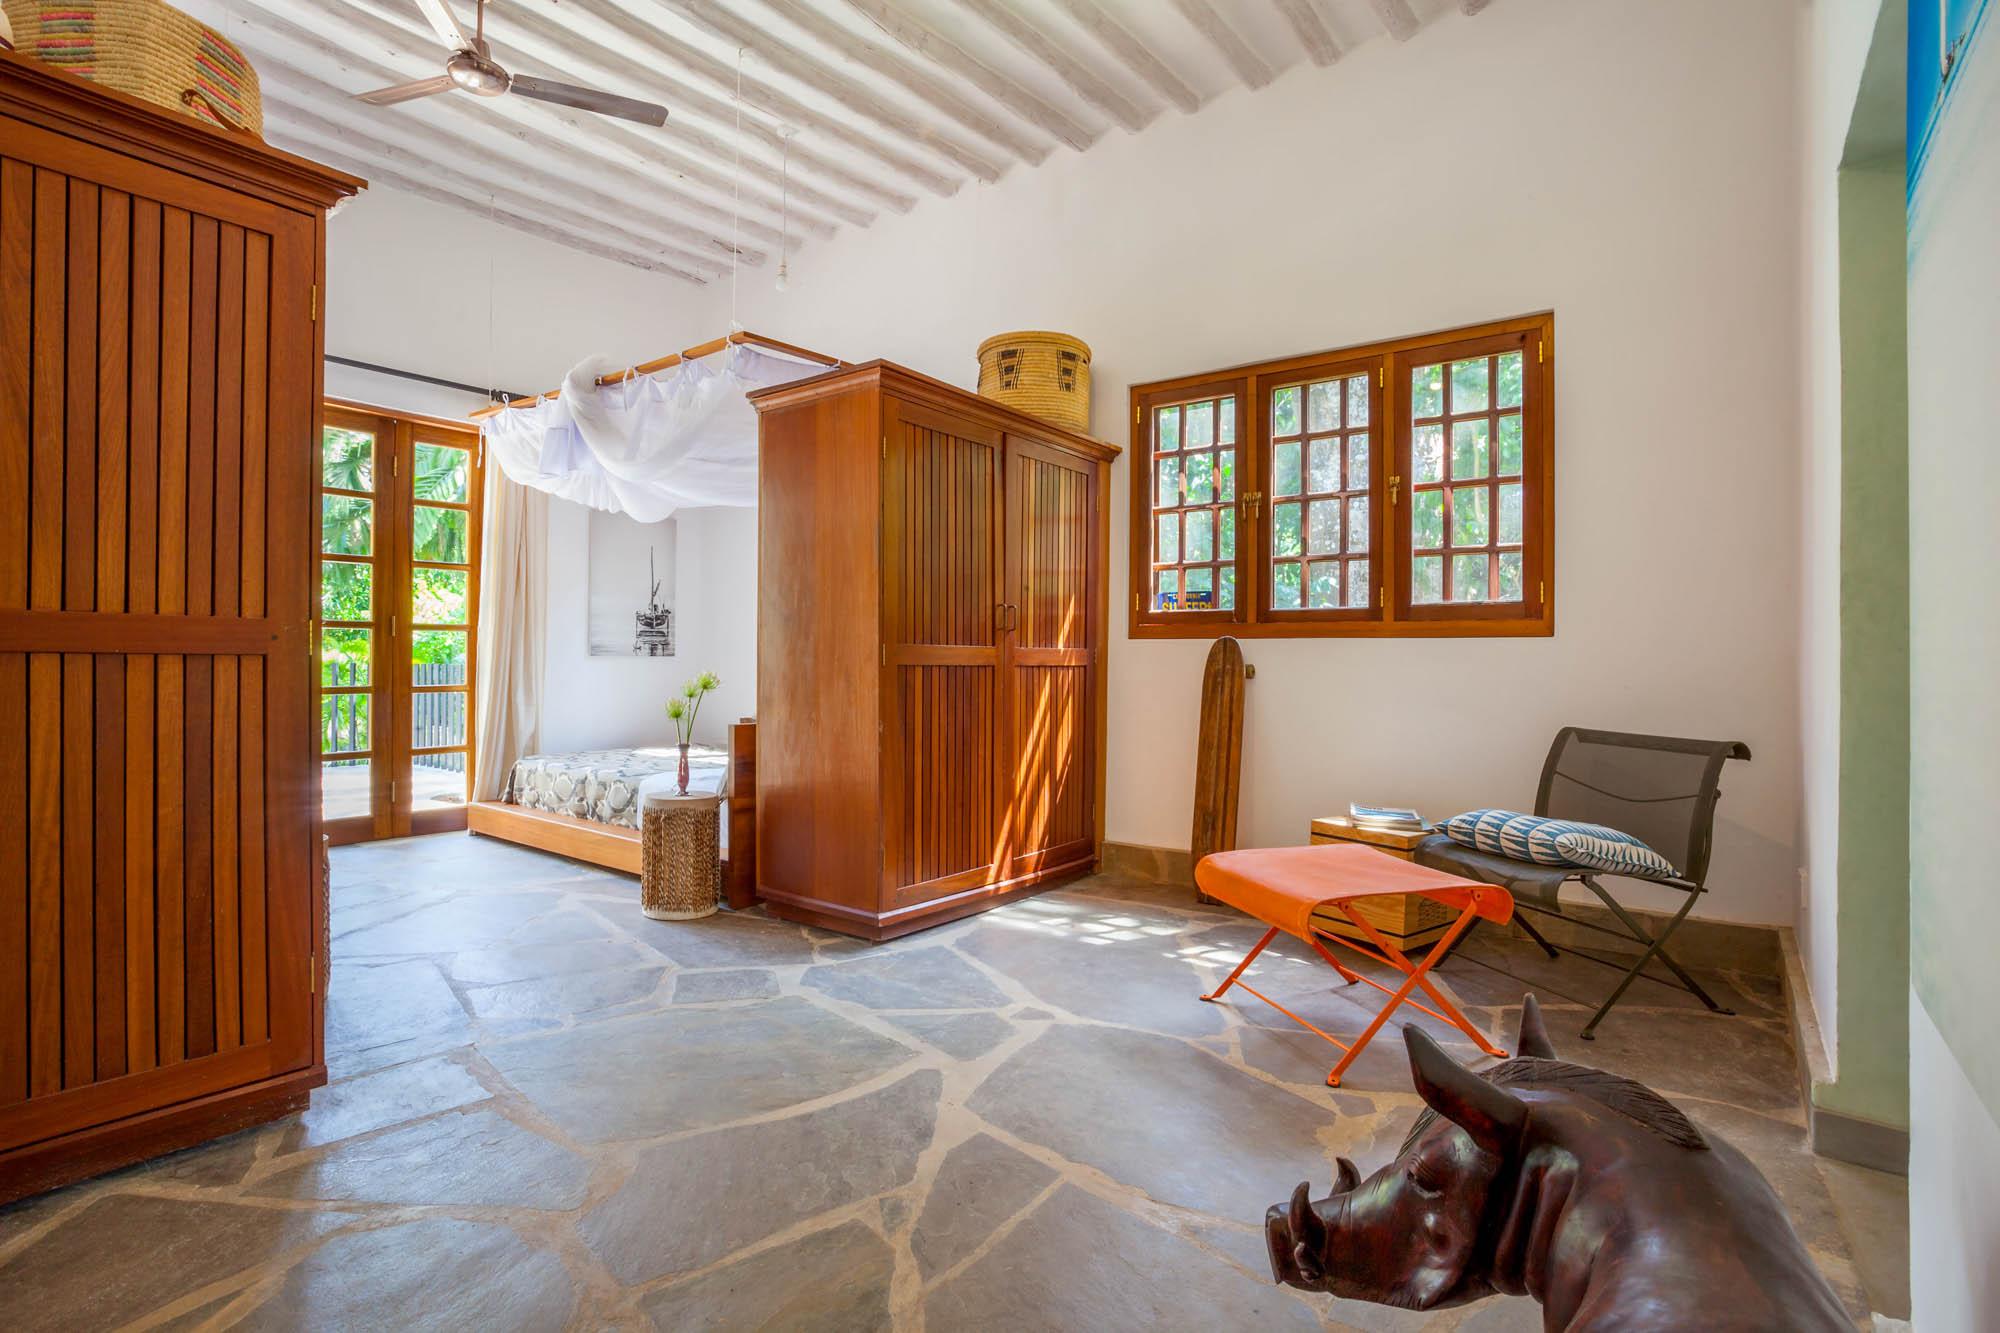 bedroom in main house